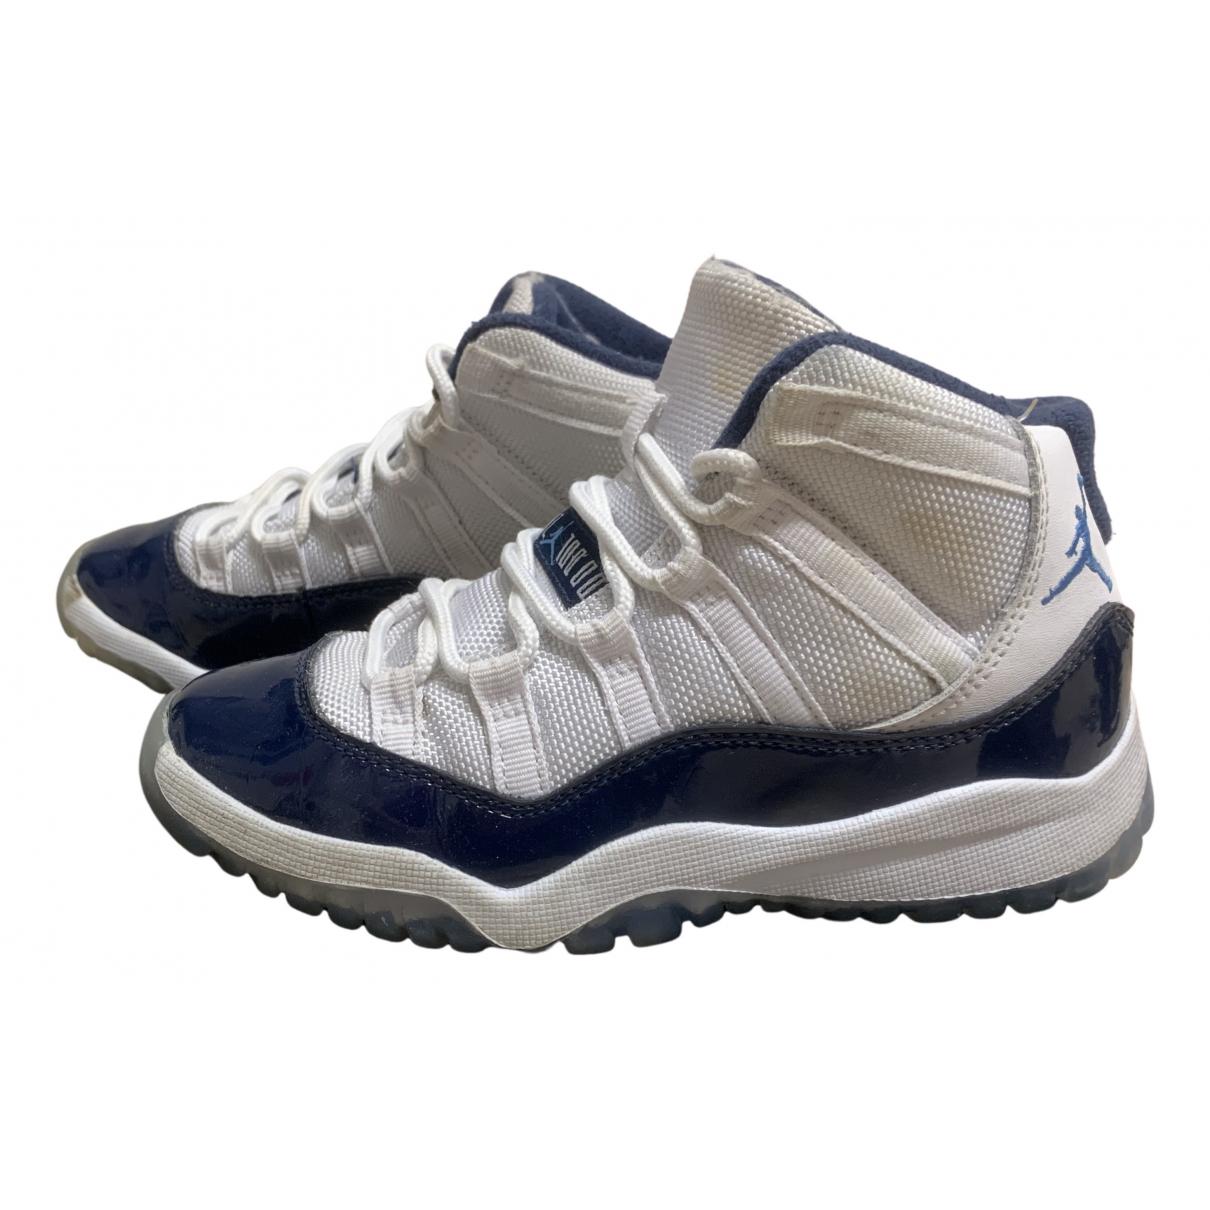 Jordan - Baskets Air Jordan 11 pour enfant en cuir - blanc